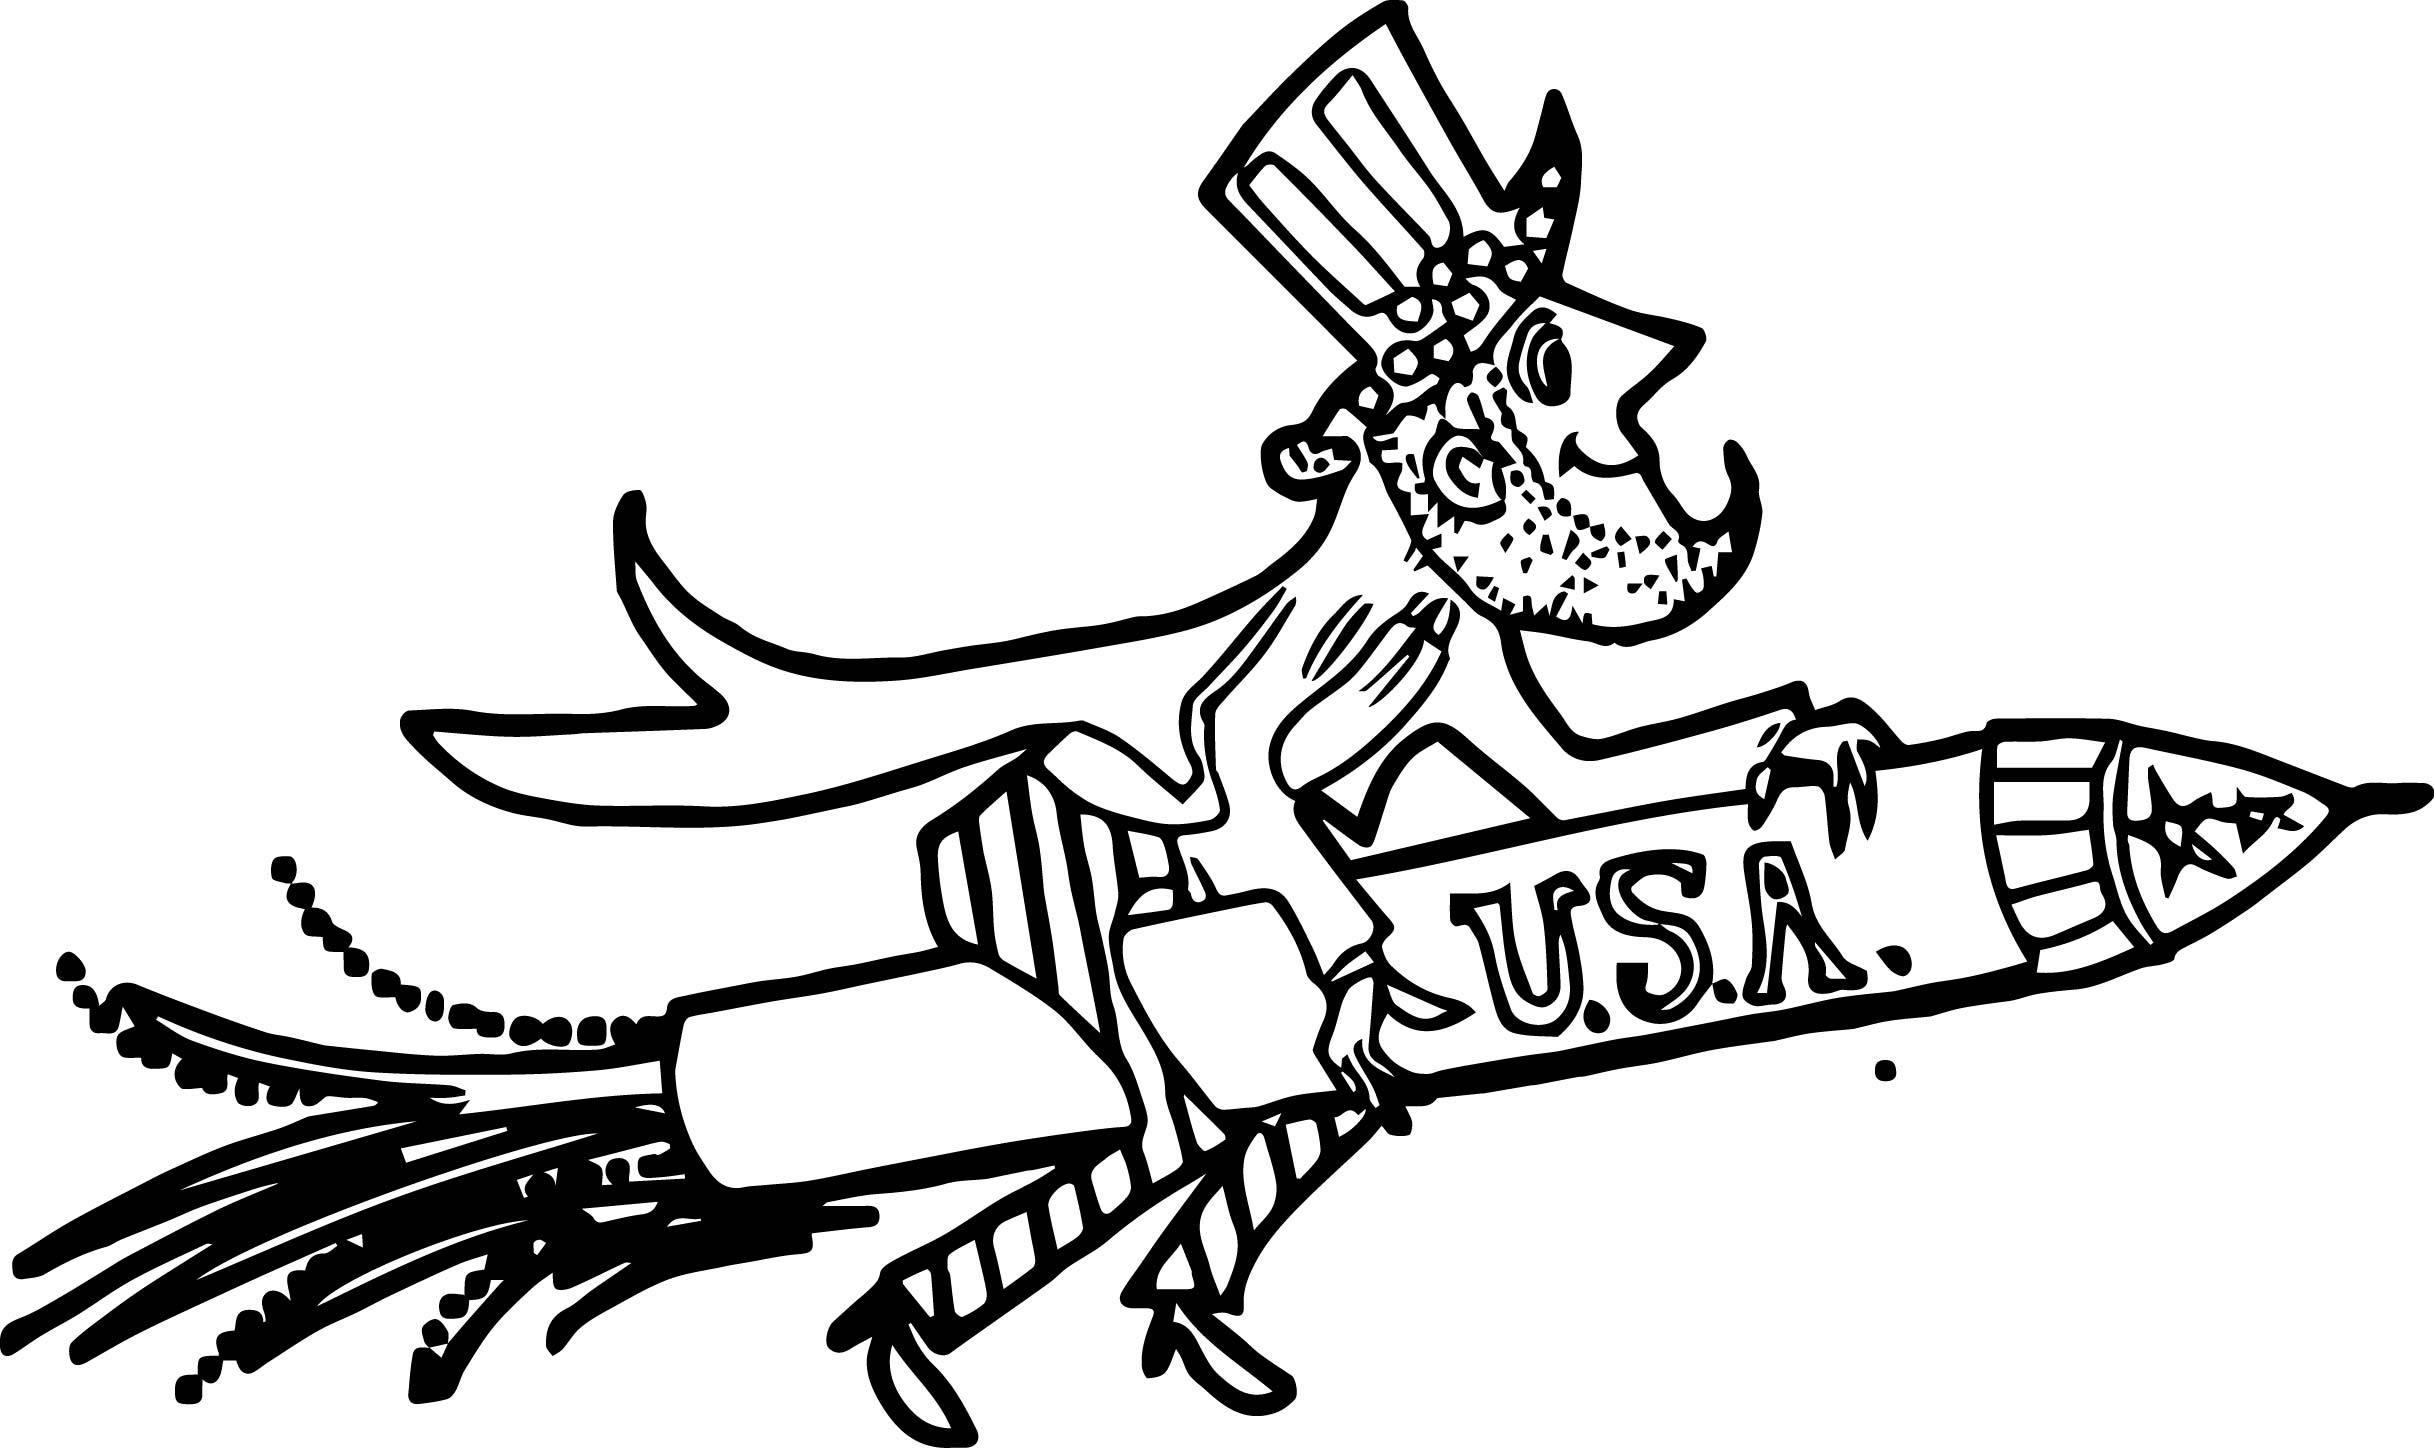 American Revolution Uncle Sam American Patriotic Rocket Firework Rider Coloring Page